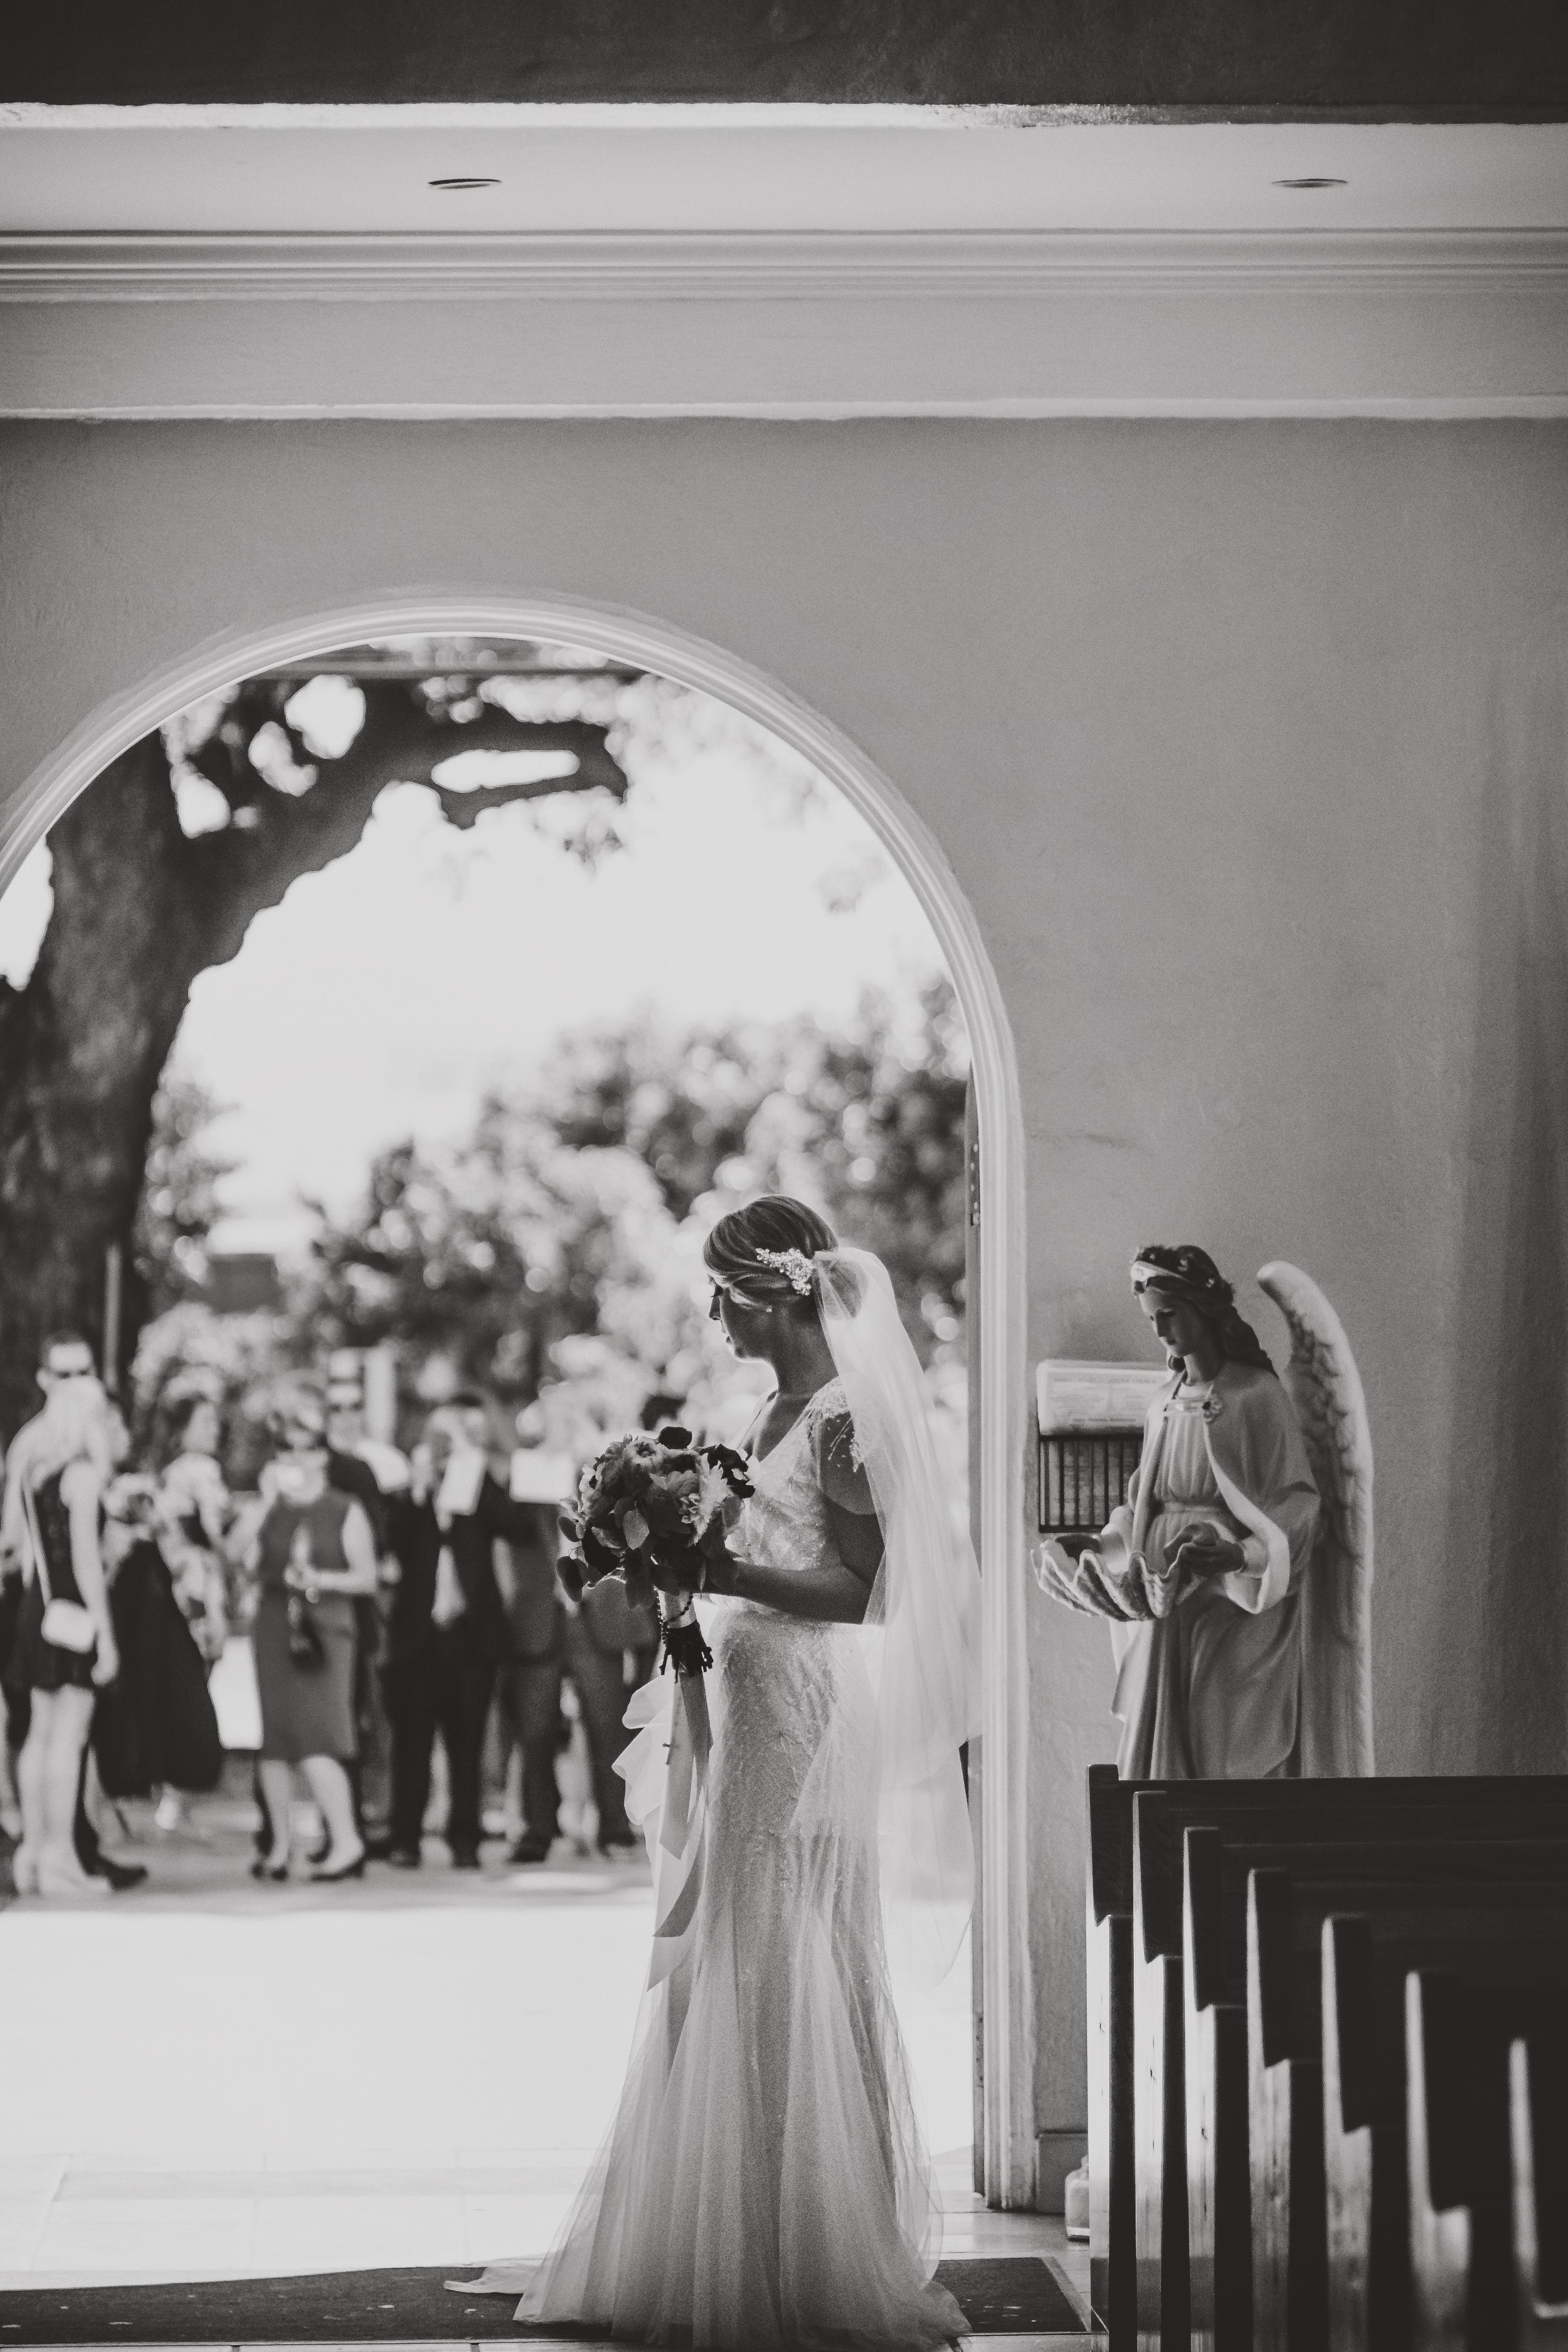 angie-diaz-photography-maui-wedding-mel-matt-48.jpeg